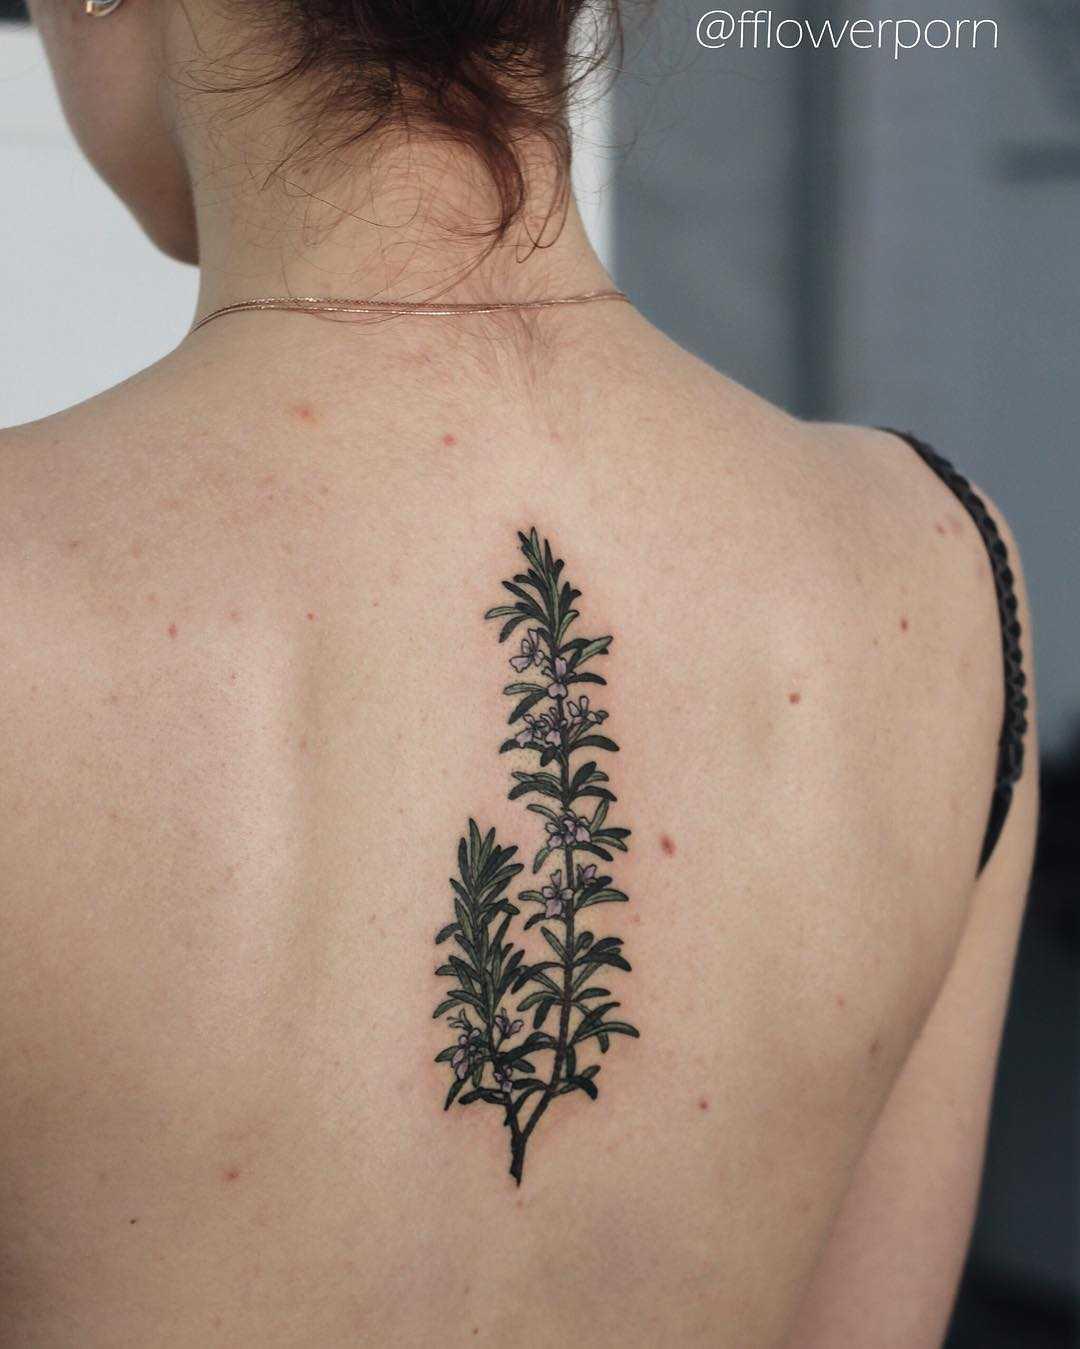 Rosemary tattoo on the back